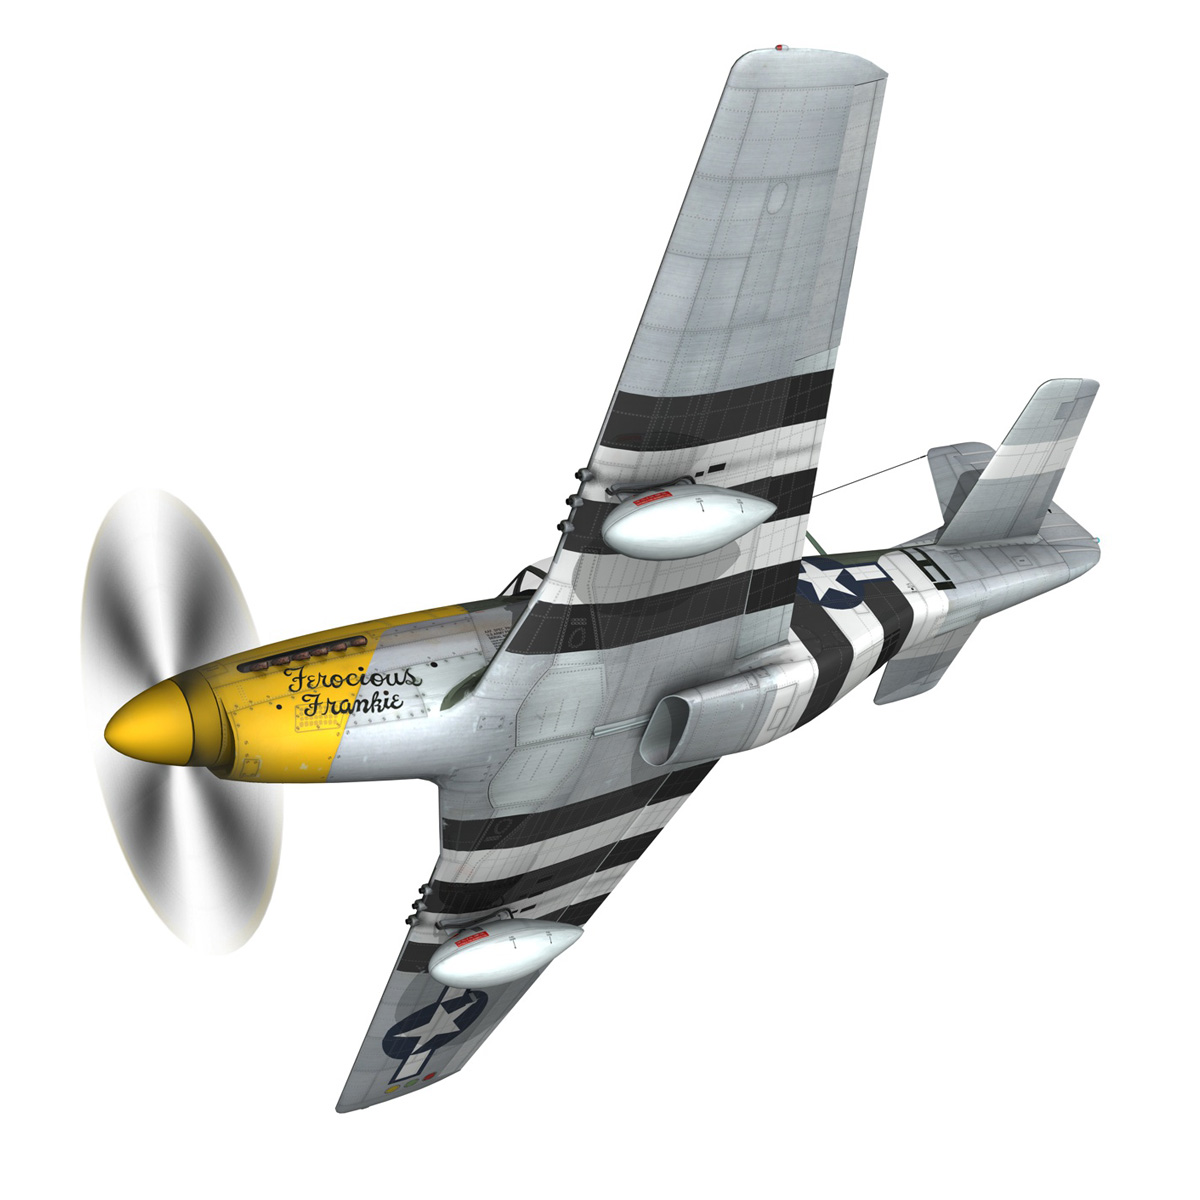 north american p-51d mustang – ferocious frankie 3d model fbx c4d lwo obj 269488